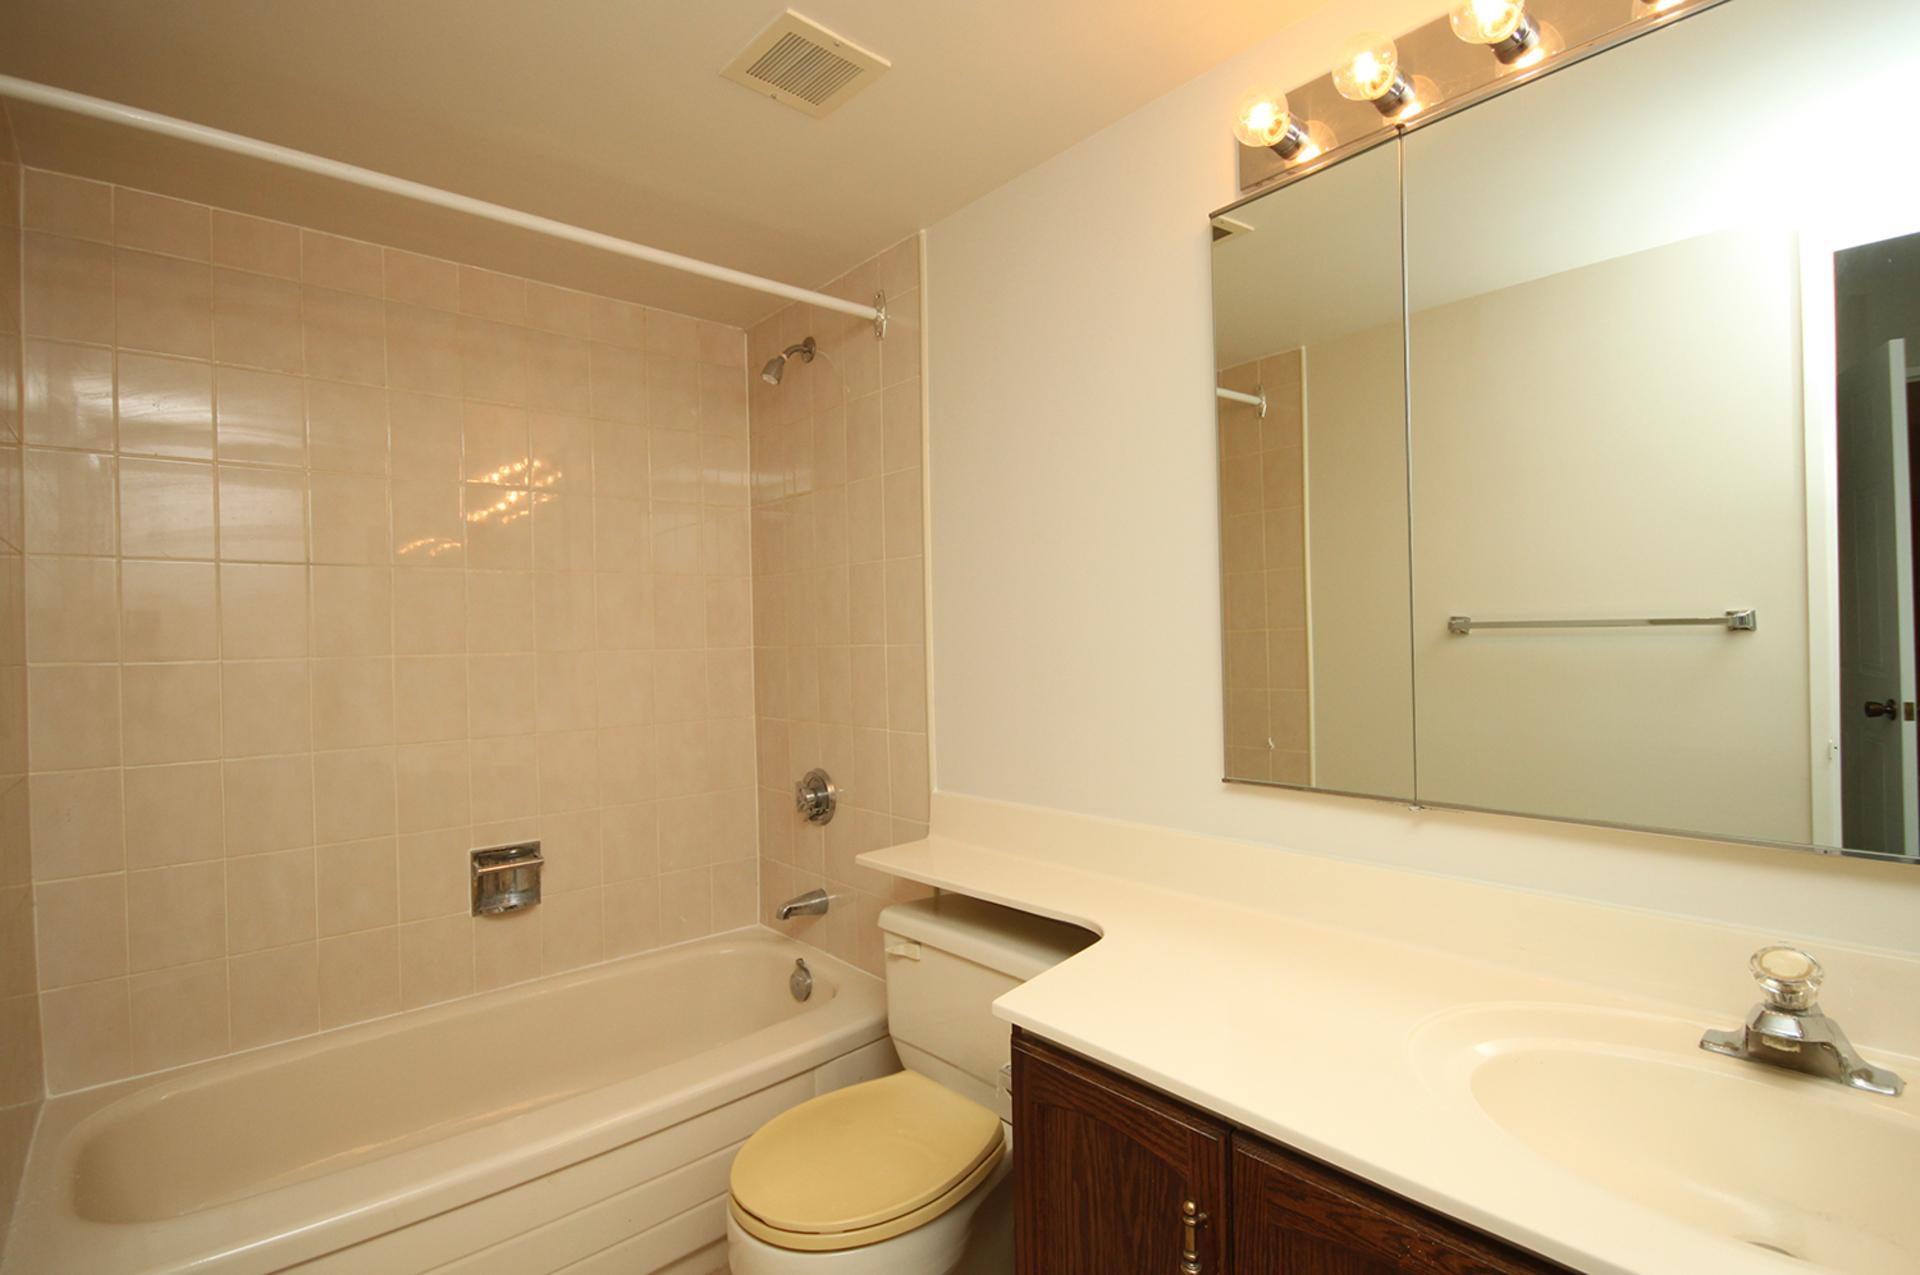 4 Piece Ensuite Bathroom at 606 - 275 Bamburgh Circle, Steeles, Toronto